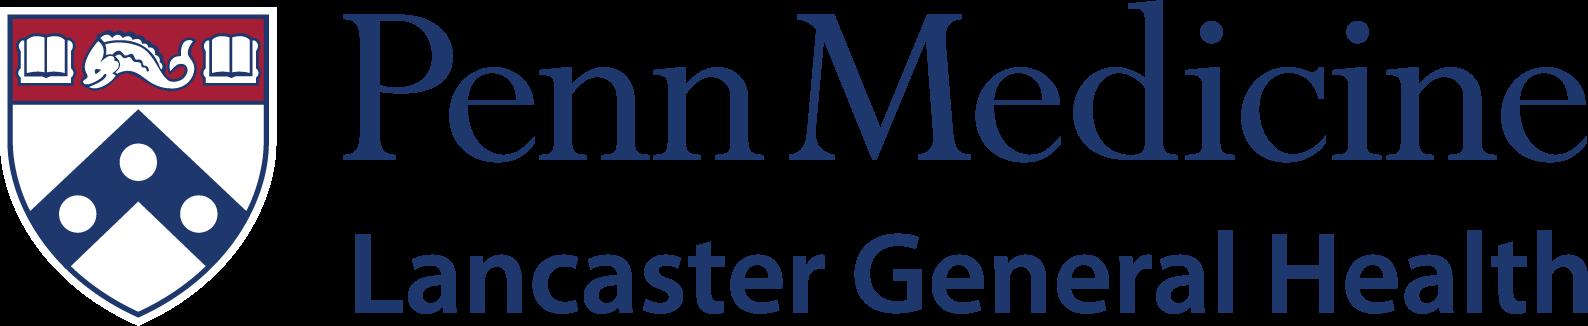 Penn Medicine Lancaster General Health Sponsor Logo